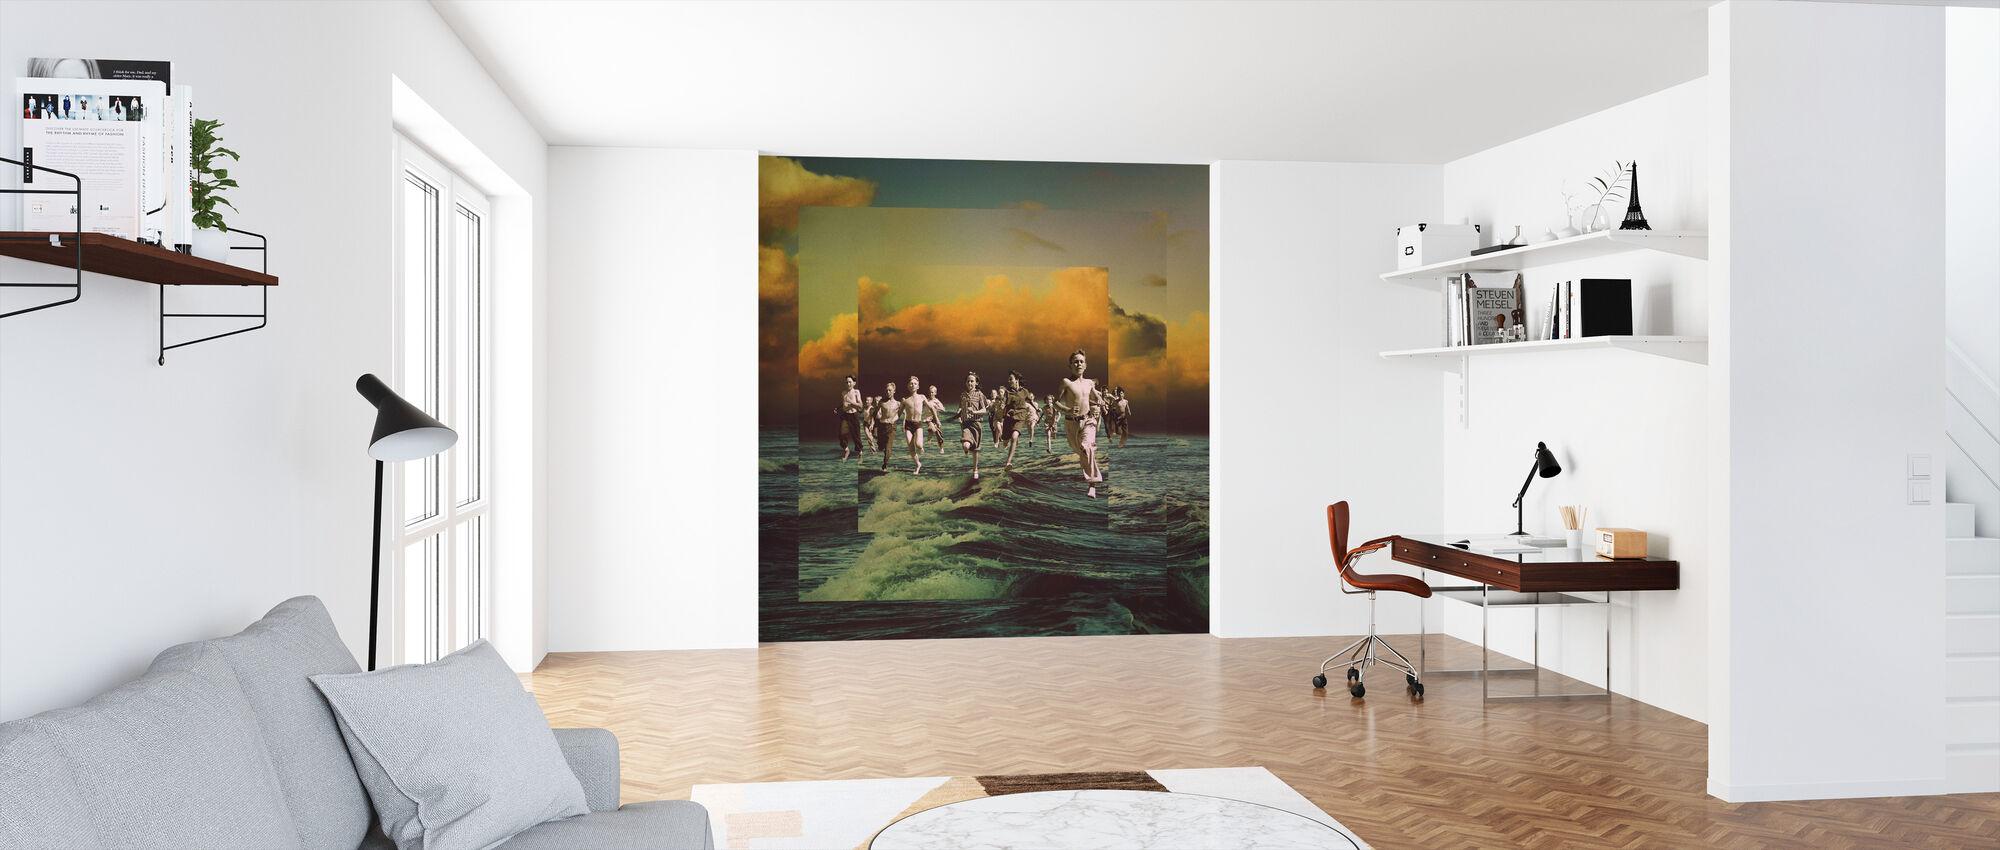 Runaway - Wallpaper - Office